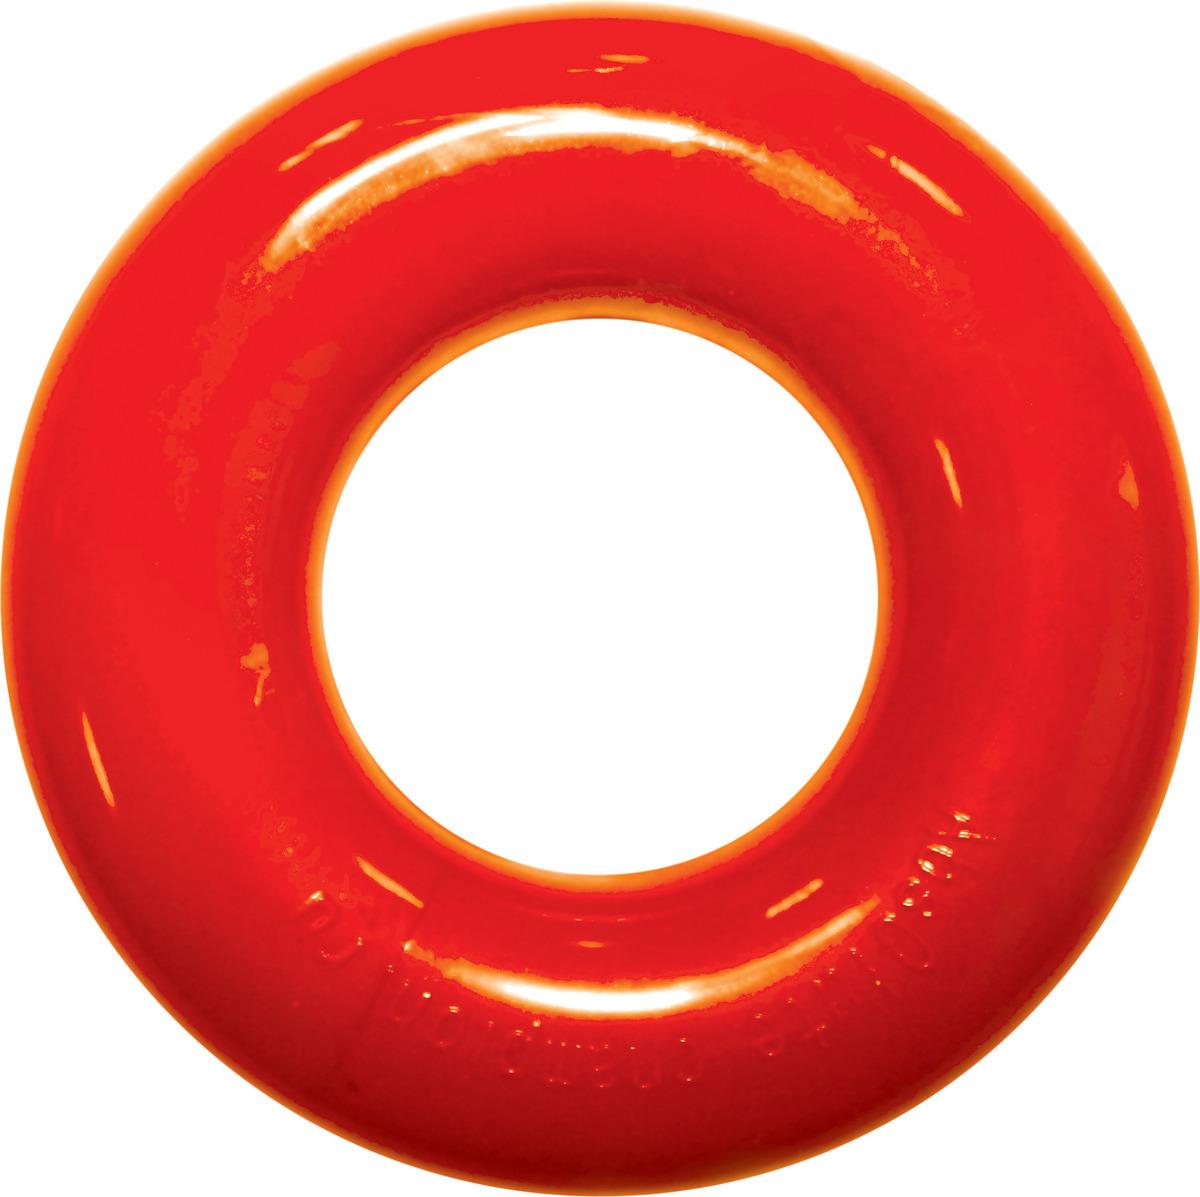 Эспандер Absolute Champion, 4690337021067, красный, усилие 10 кг